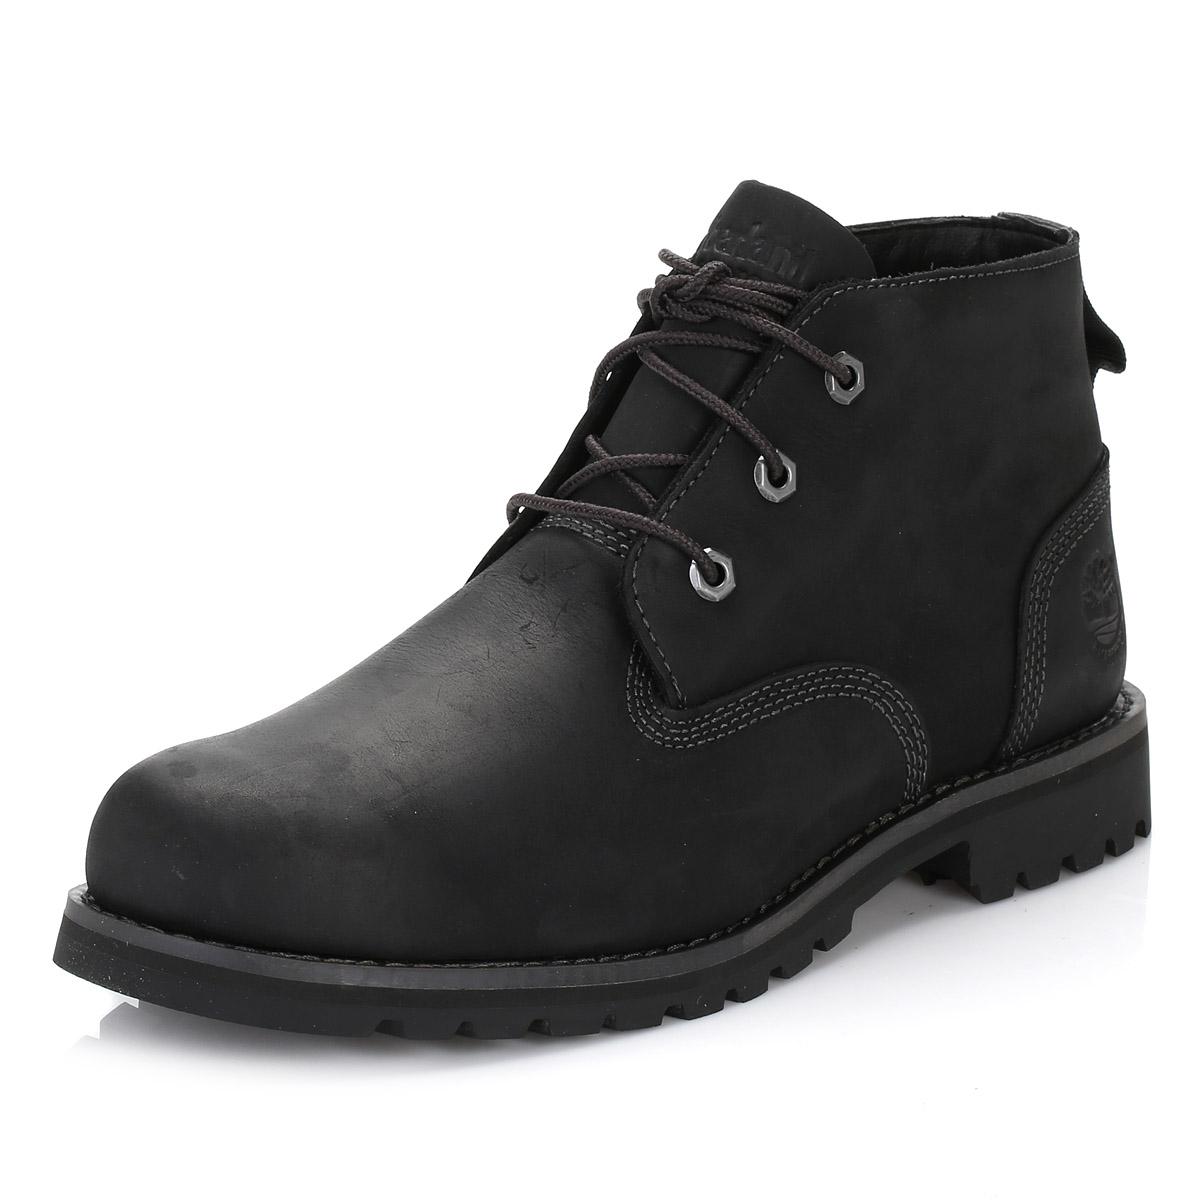 Timberland Mens Chukka Boots Black Leather Larchmont Waterproof